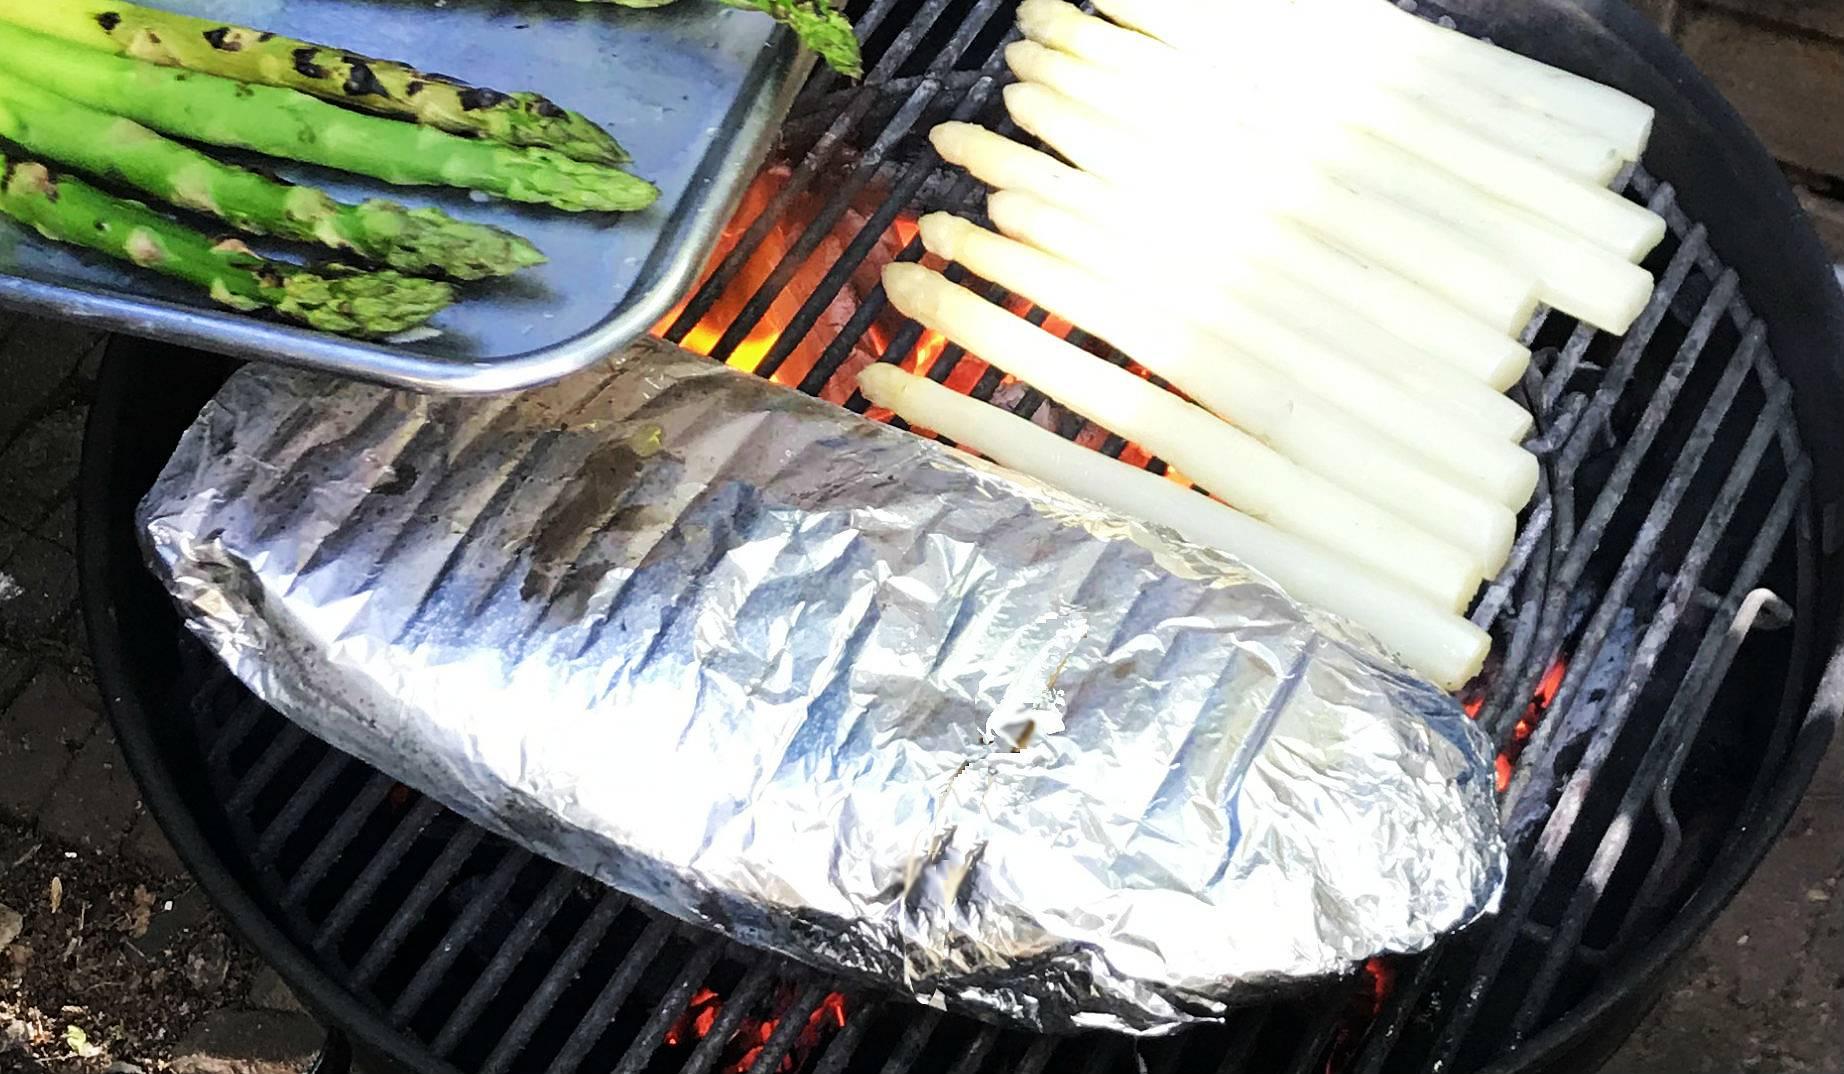 Zalmpakket op de barbecue